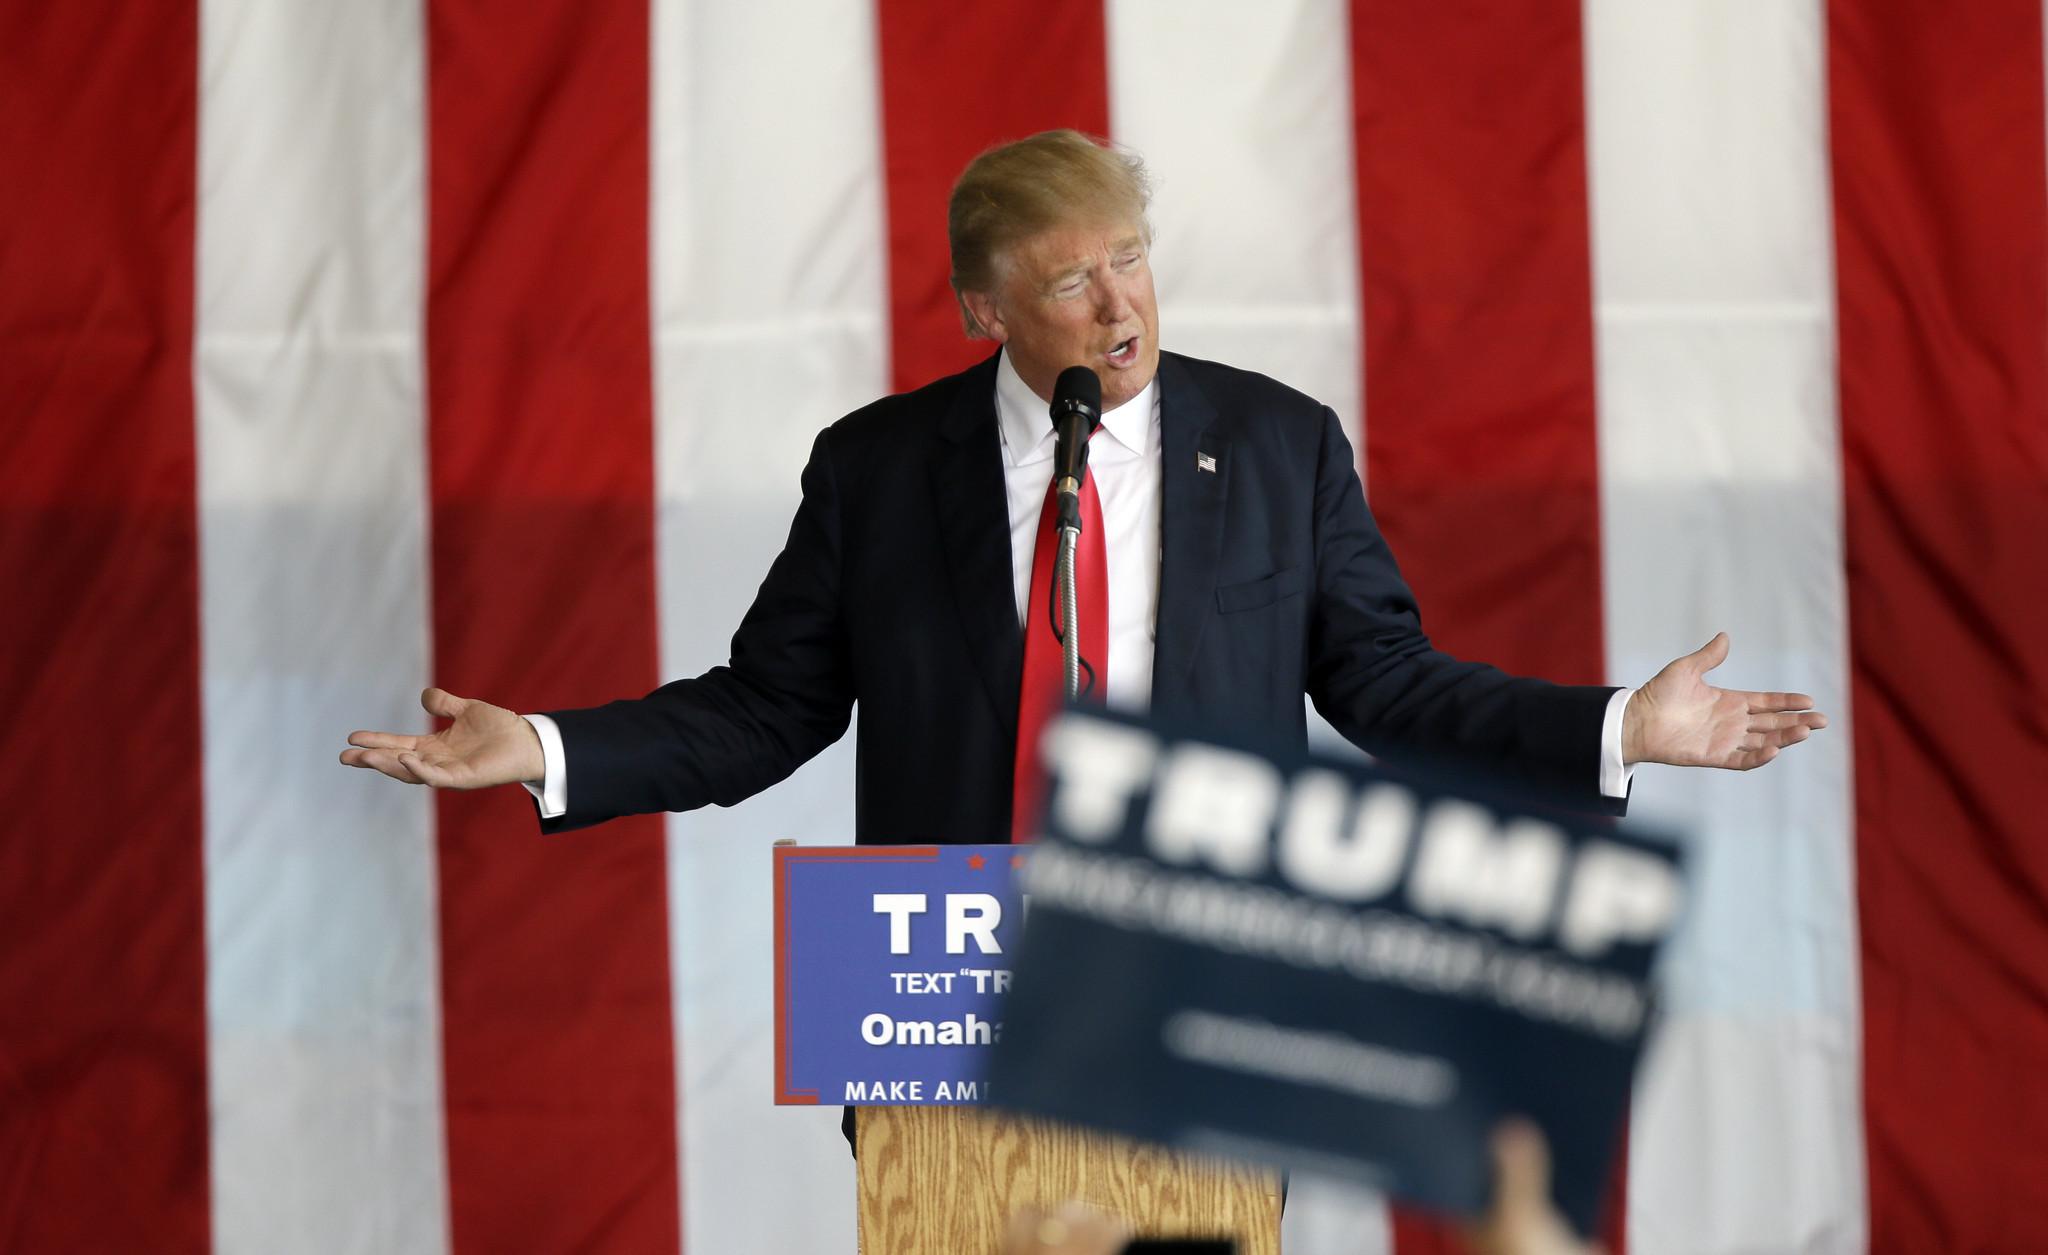 Donald Trump's self-destruction begins